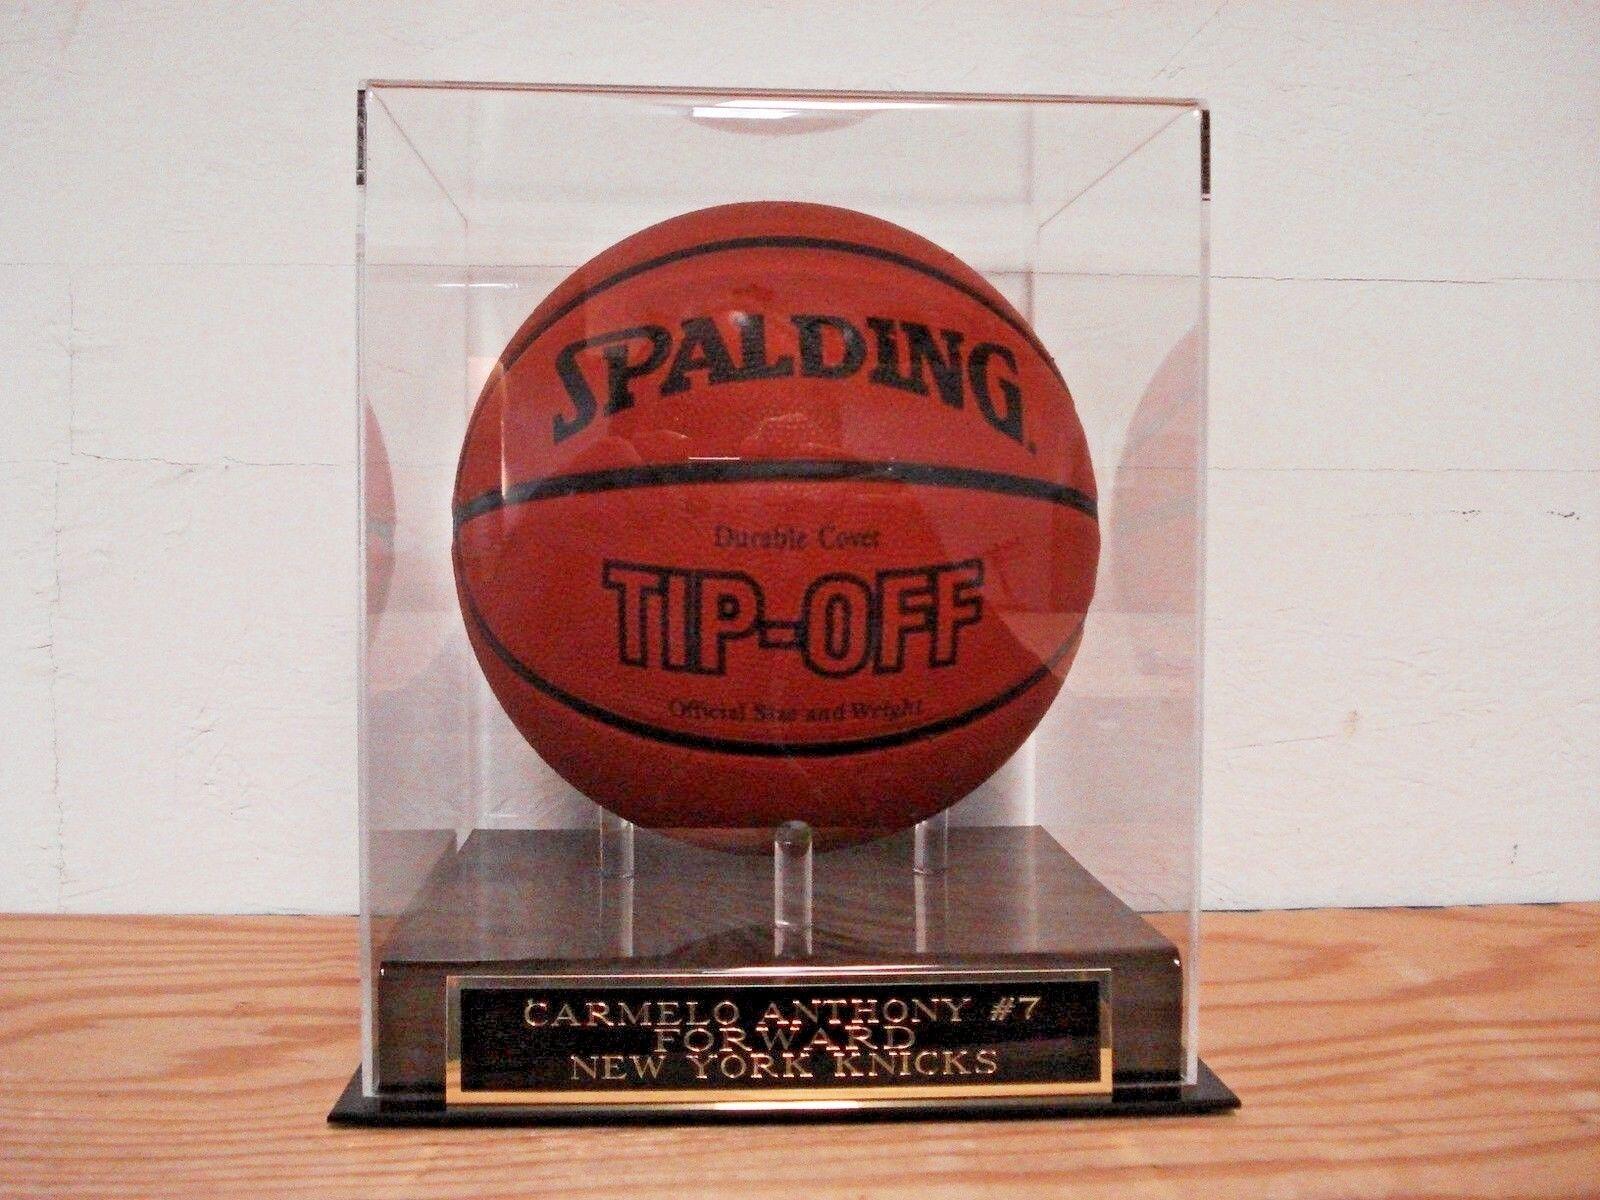 Carmelo Anthony Basketball Display Case W/ A New York Knicks